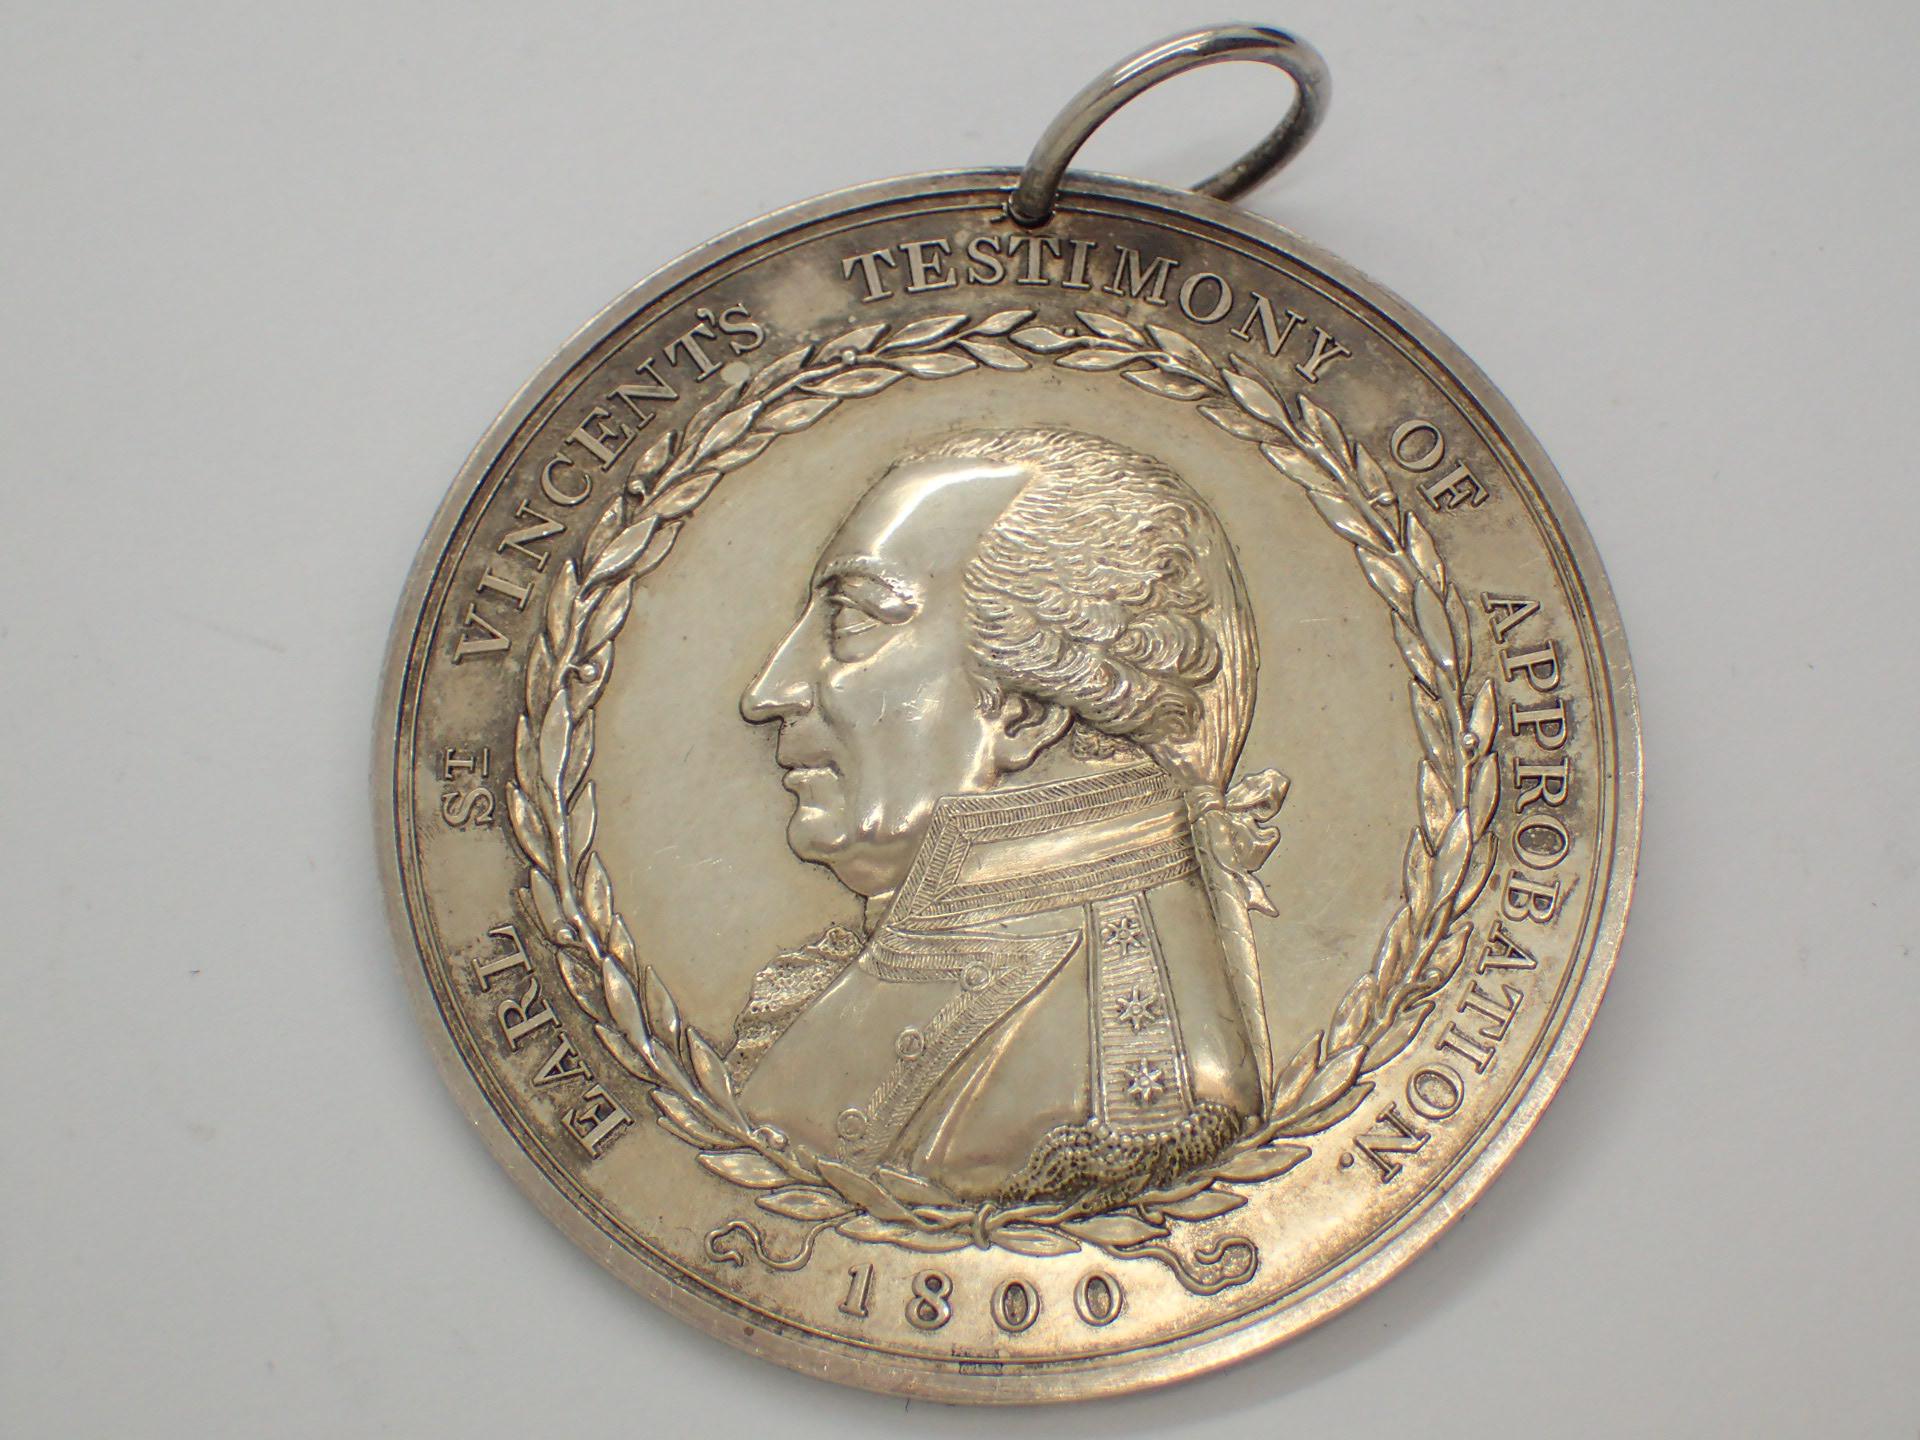 Lot 83 - Earl St Vincents medal 1800 silver 48 mm